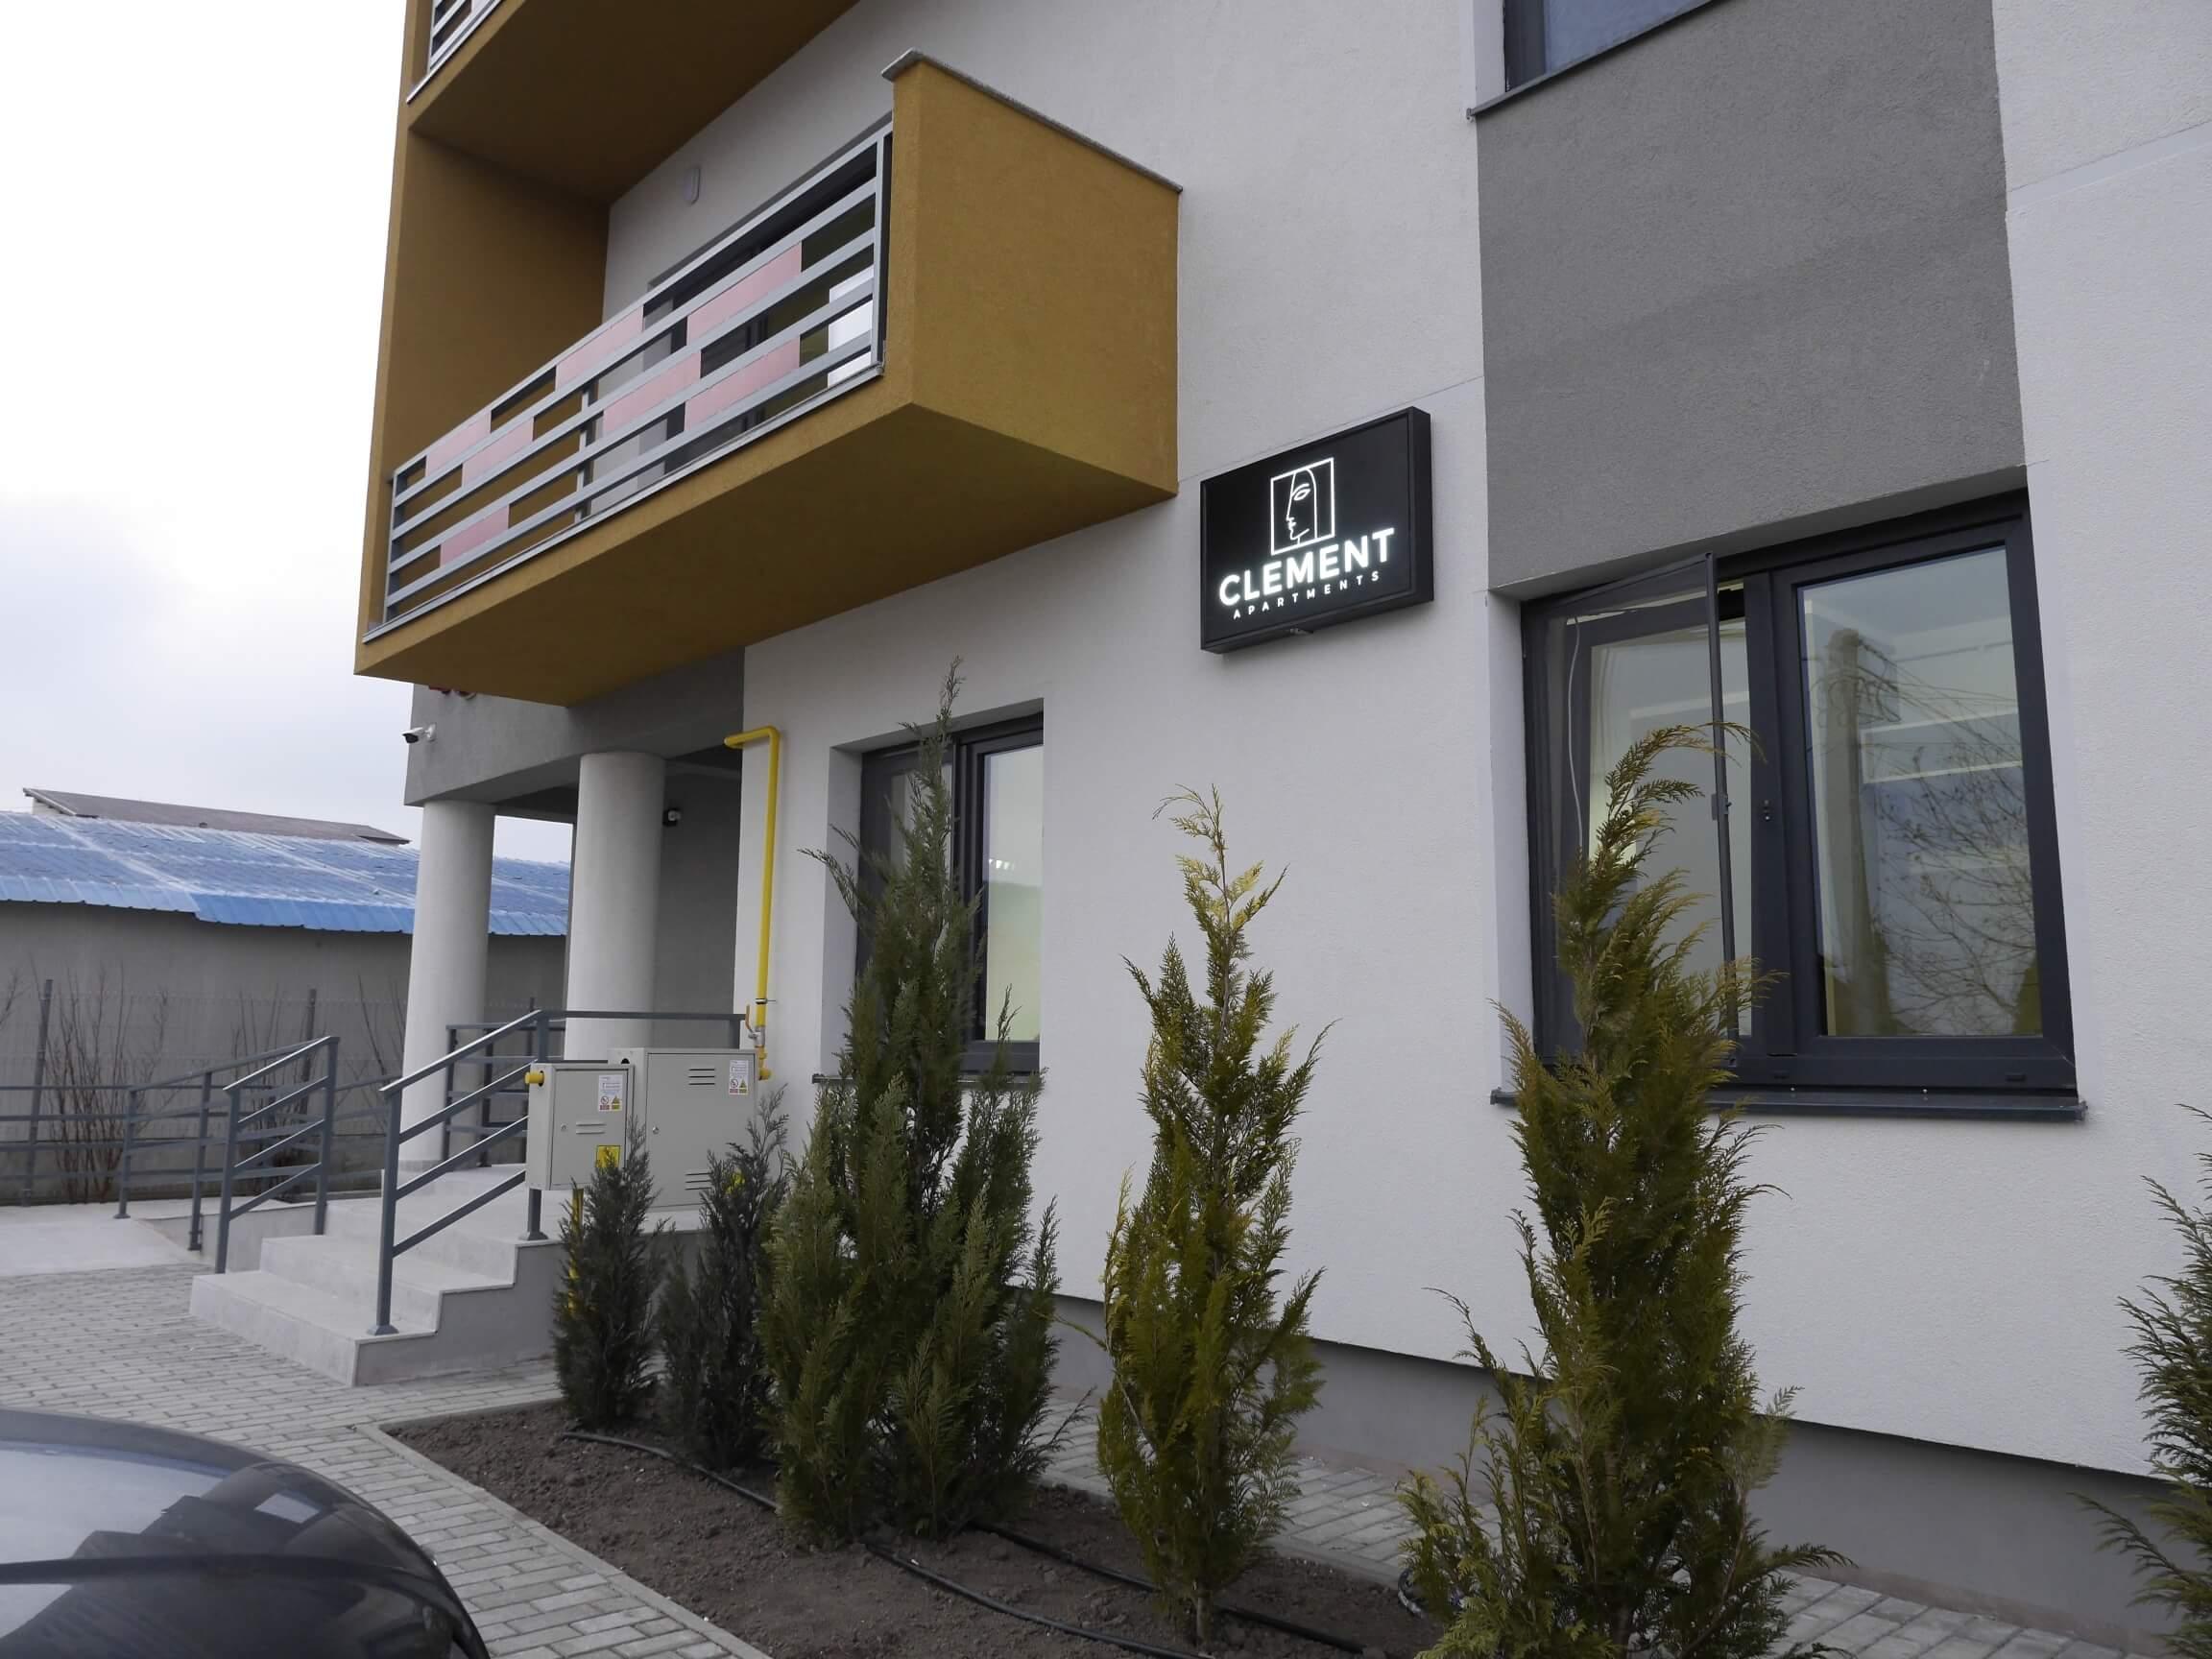 Clement Apartments - Cazare Neamt - Cazare Piatra Neamt - Apartamente de inchiriat in regim hotelier (1)